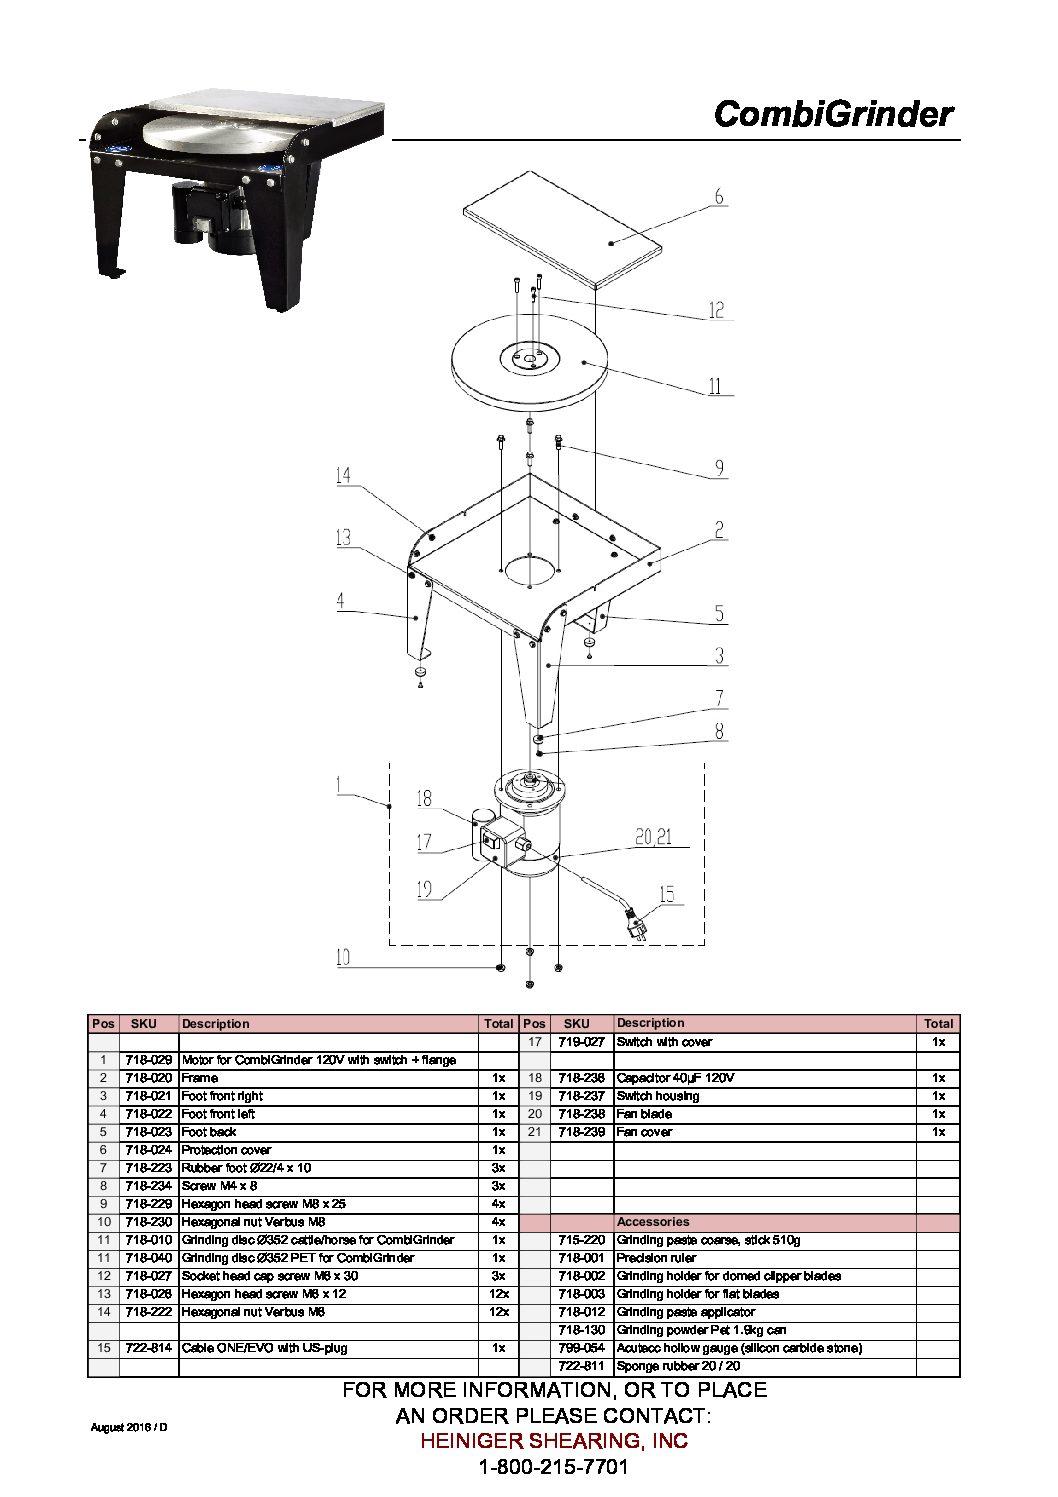 CombiGrinder Parts